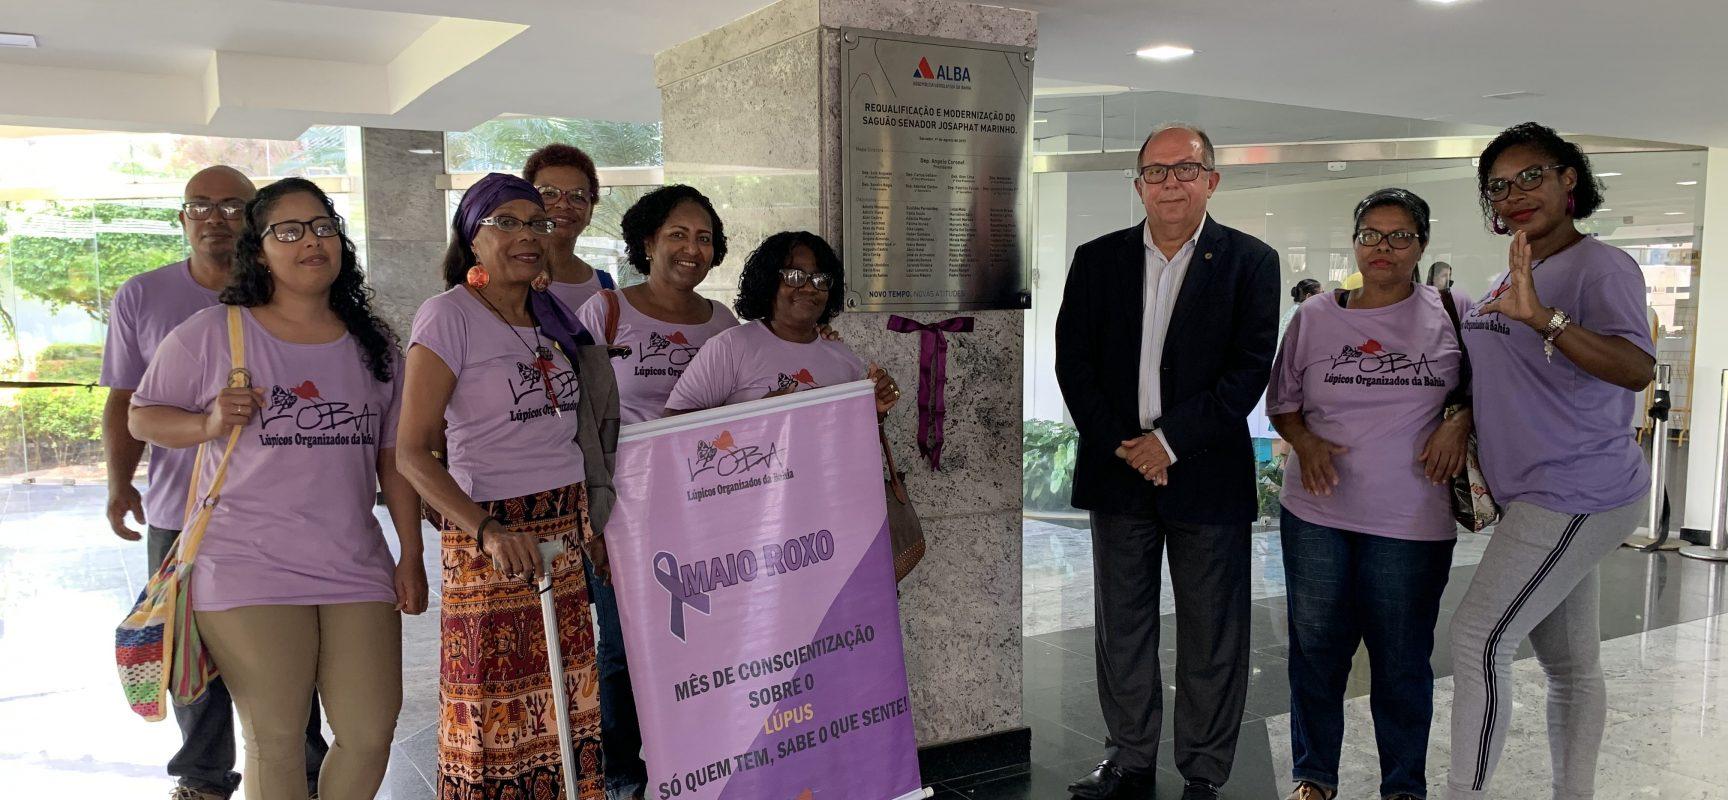 Deputado José de Arimateia promove Roda de Conversa sobre o Lúpus na ALBA